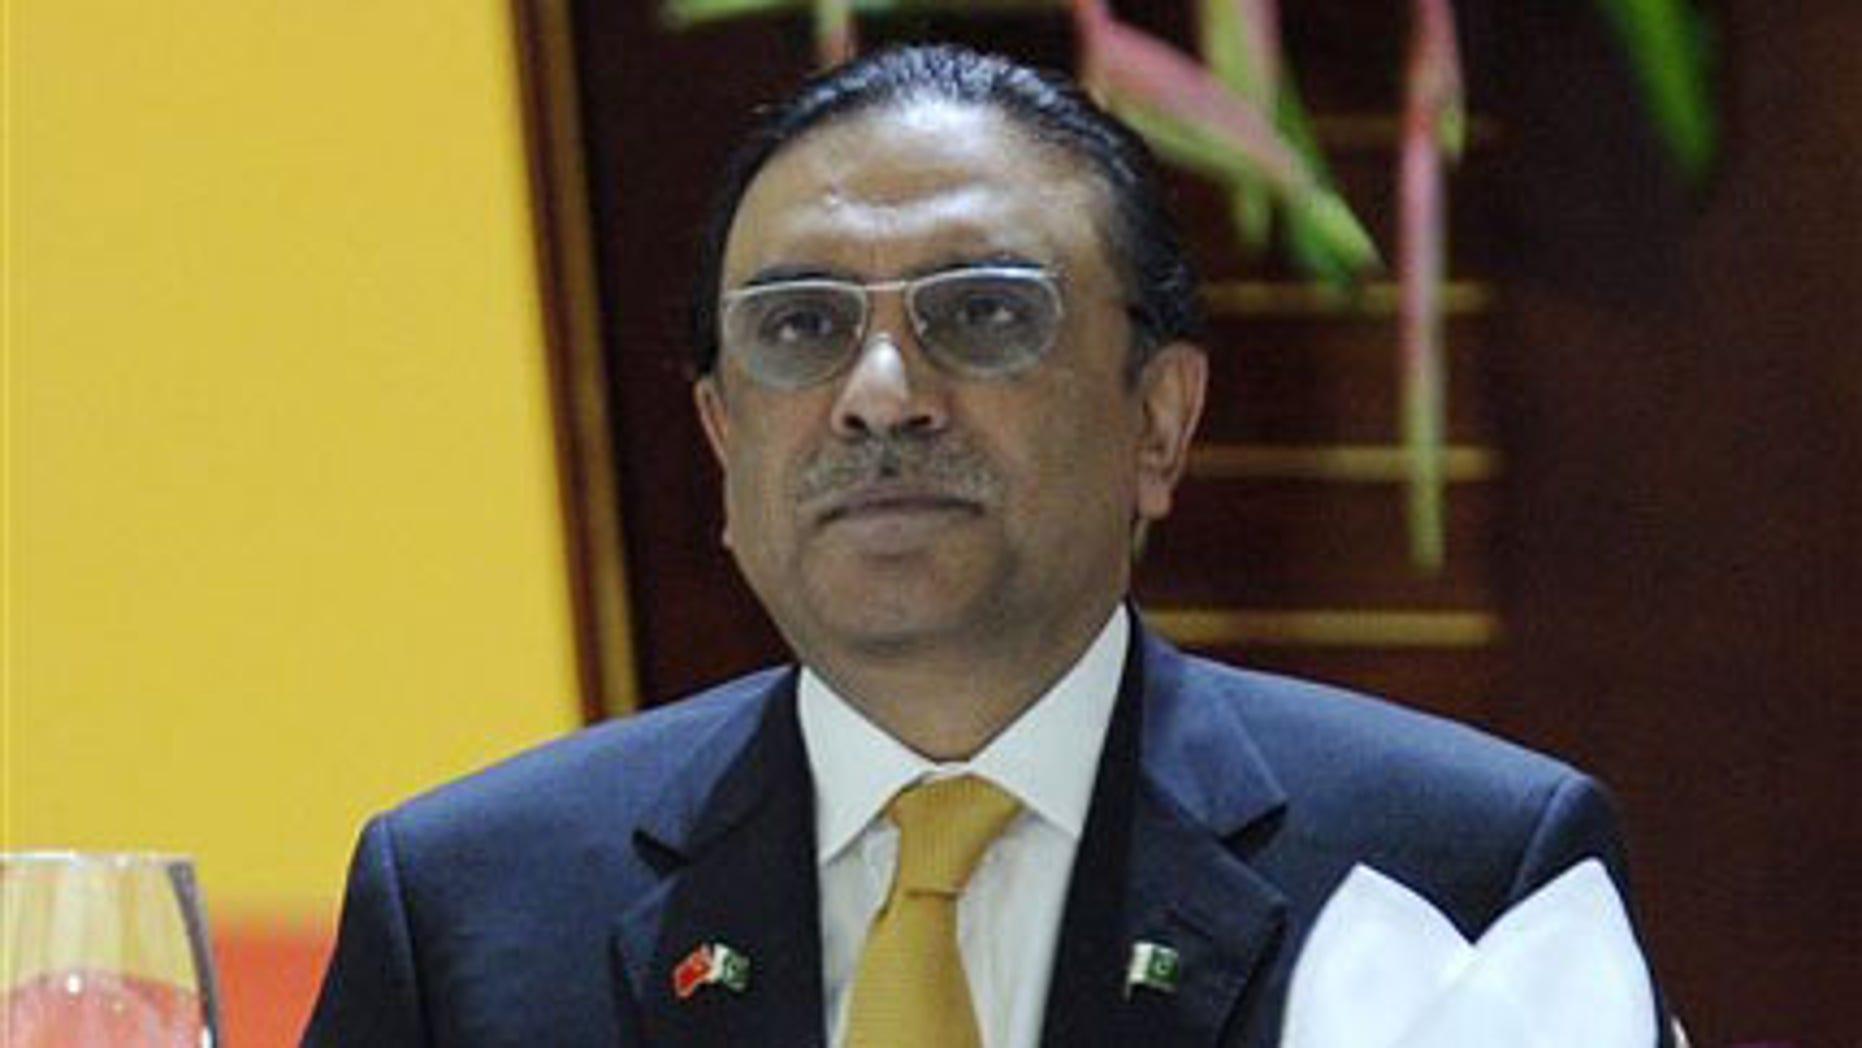 November 29, 2010: Pakistani President Asif Ali Zardari at a banquet in Guangzhou, China.